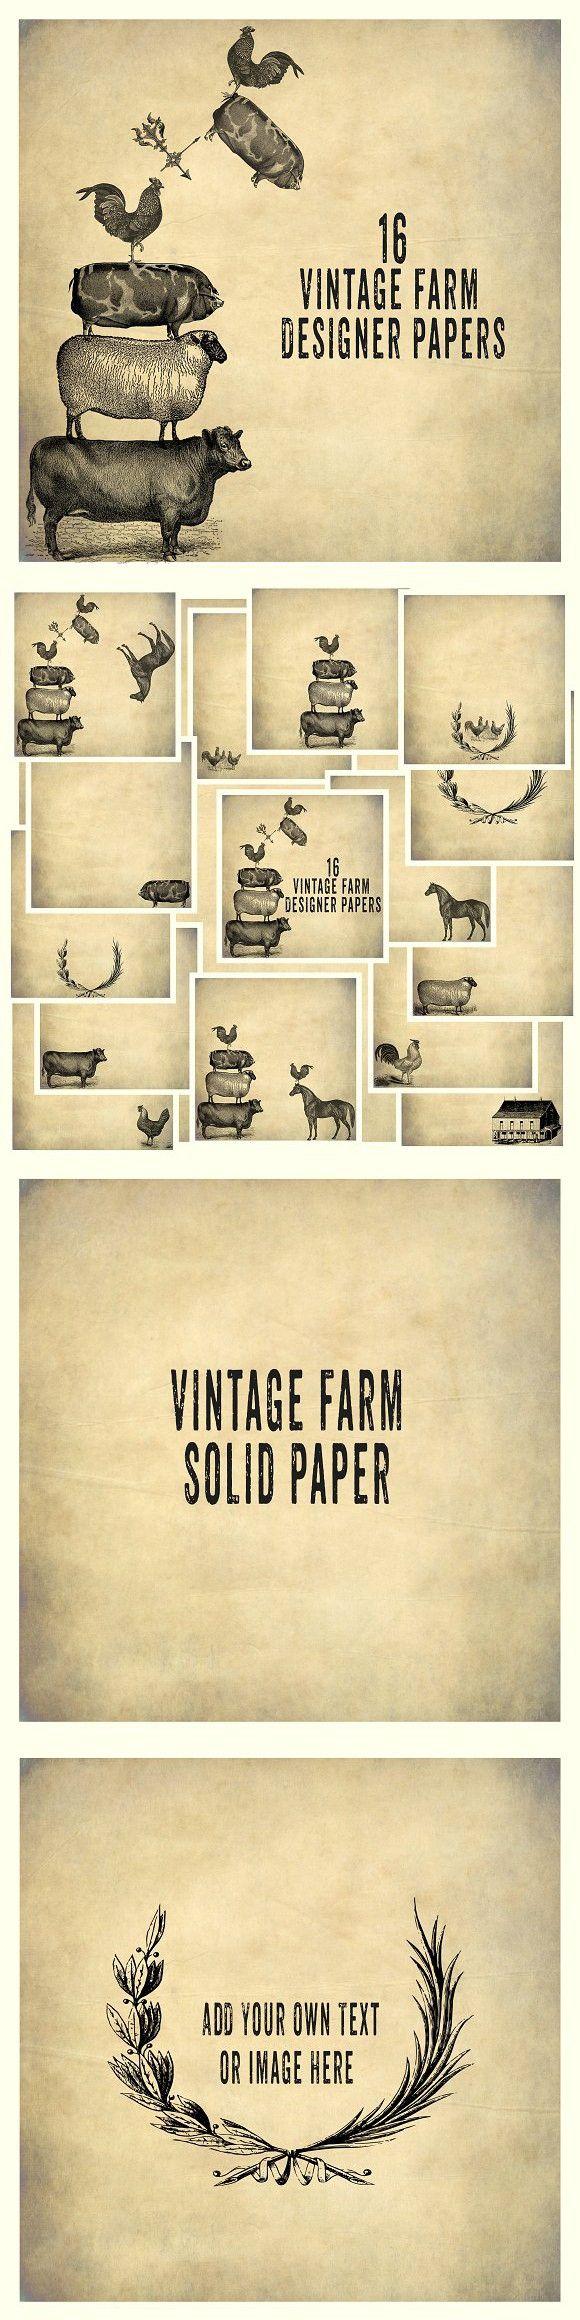 Vintage Farm Background Papers. Patterns